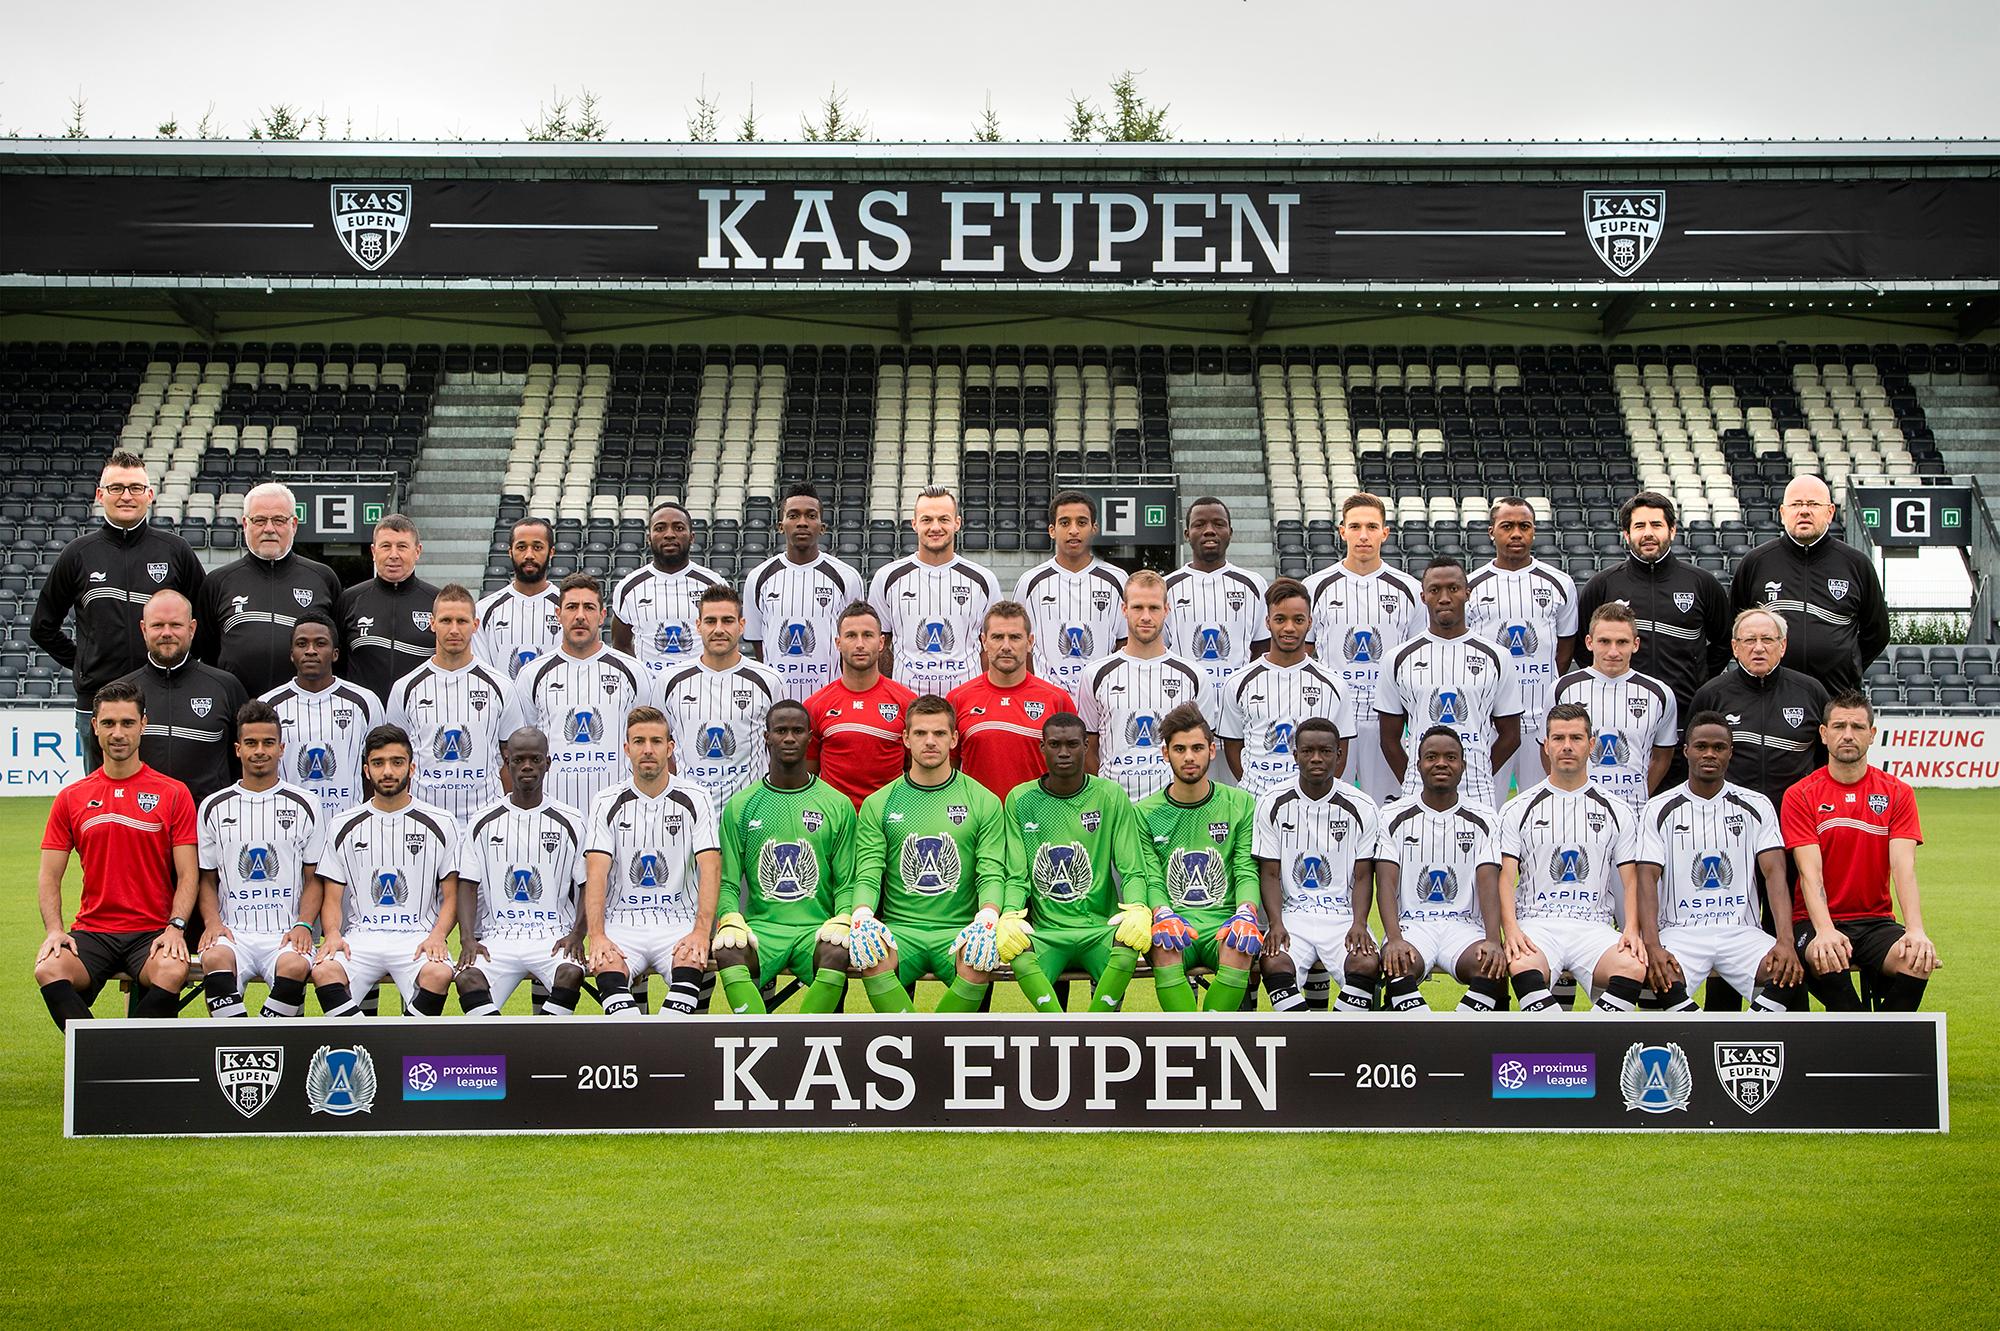 Eupen  Club Brugge Photo: Eupen (LIVE STREAM